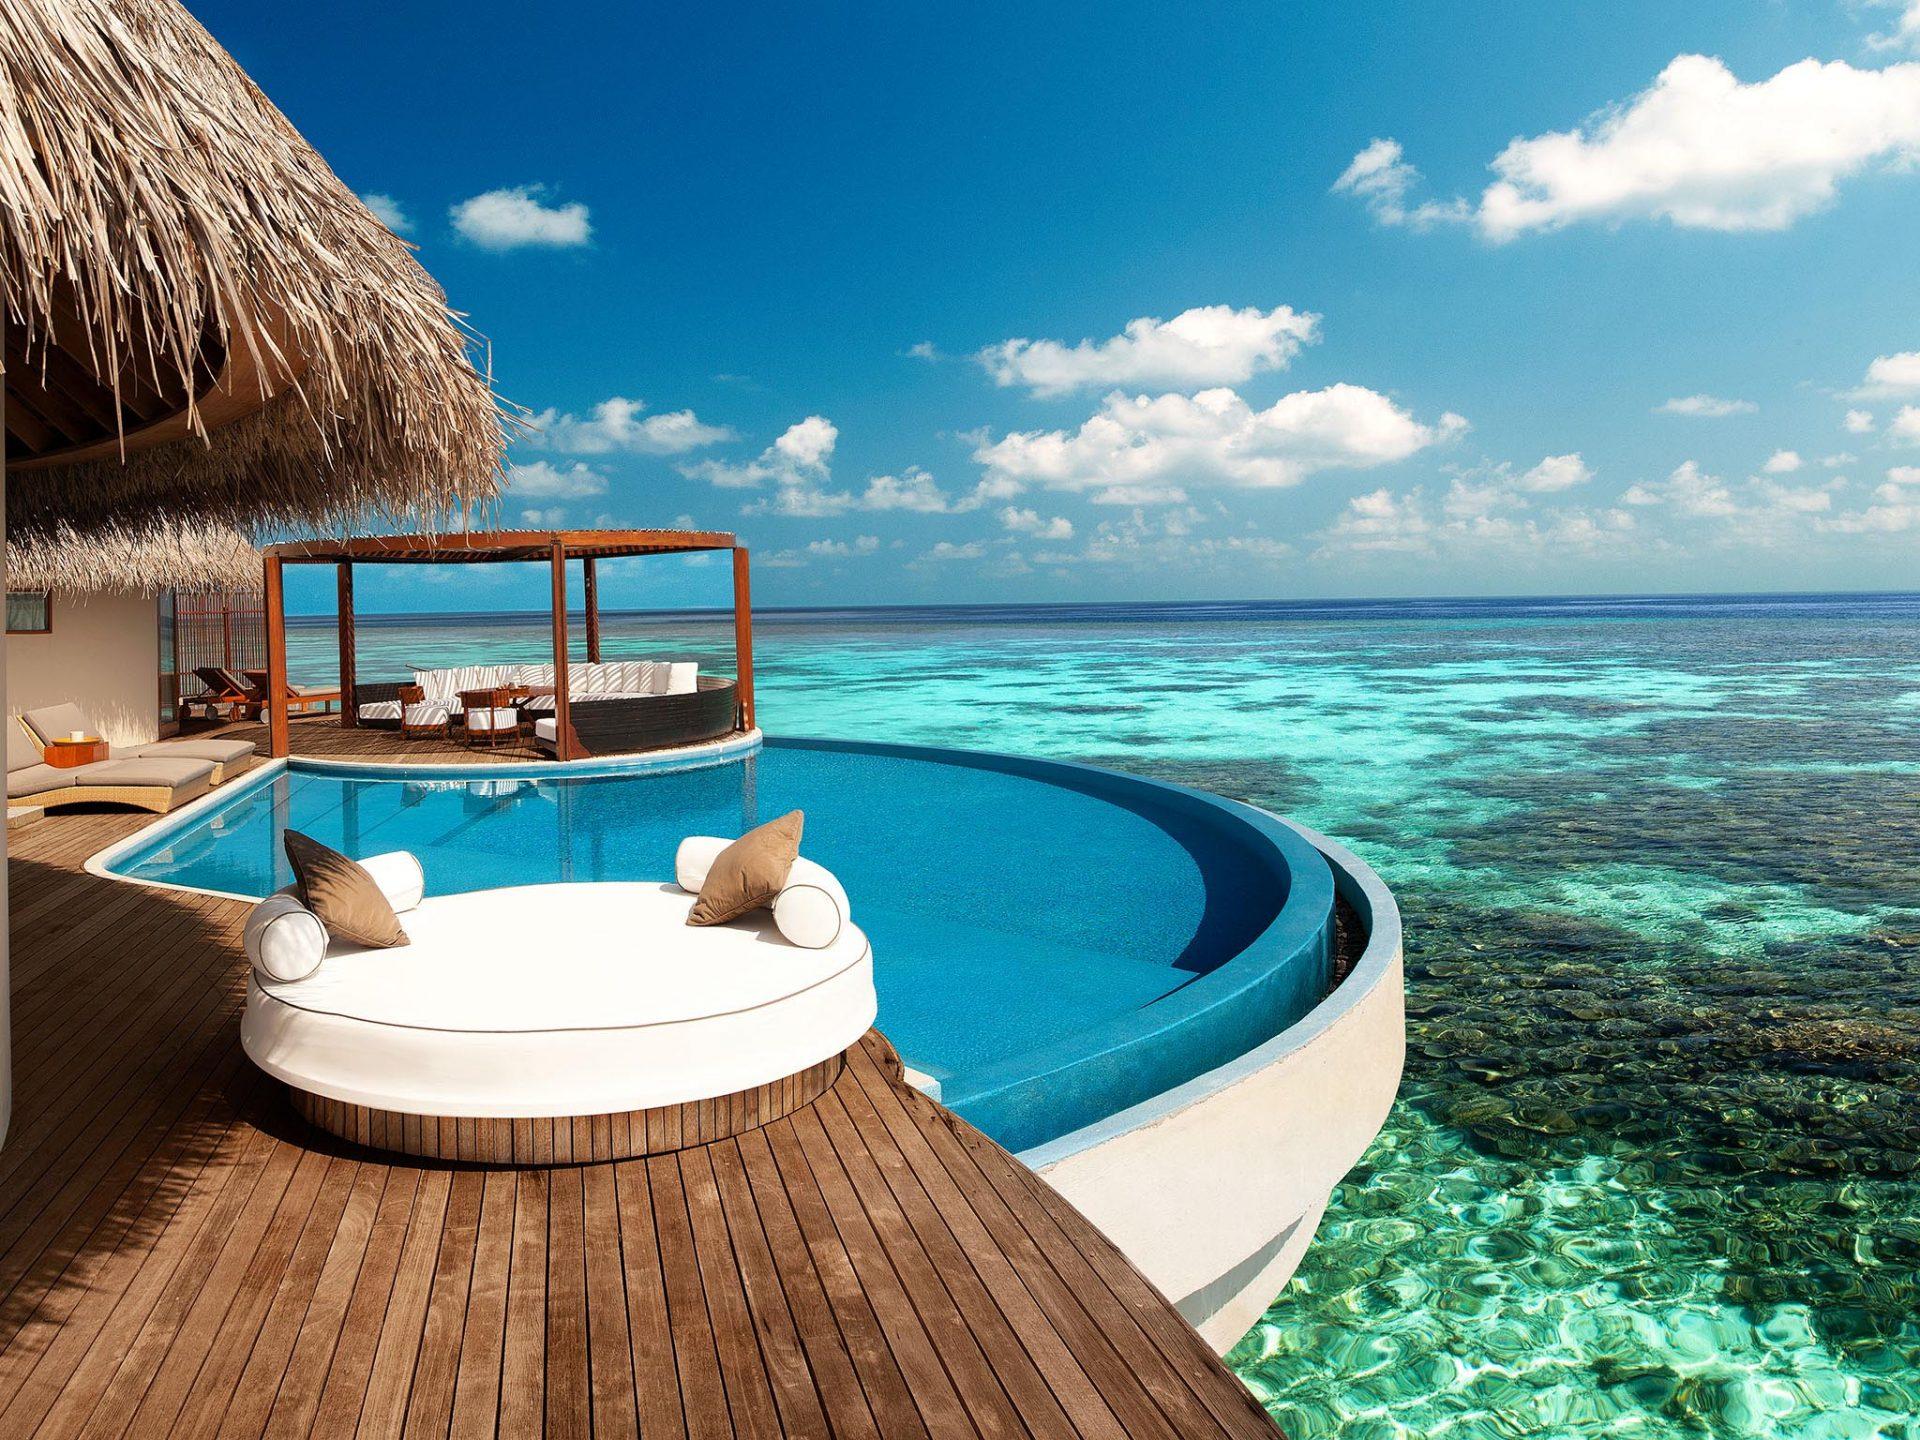 4 – Luxurious Quarantine in The Most Beautiful Island